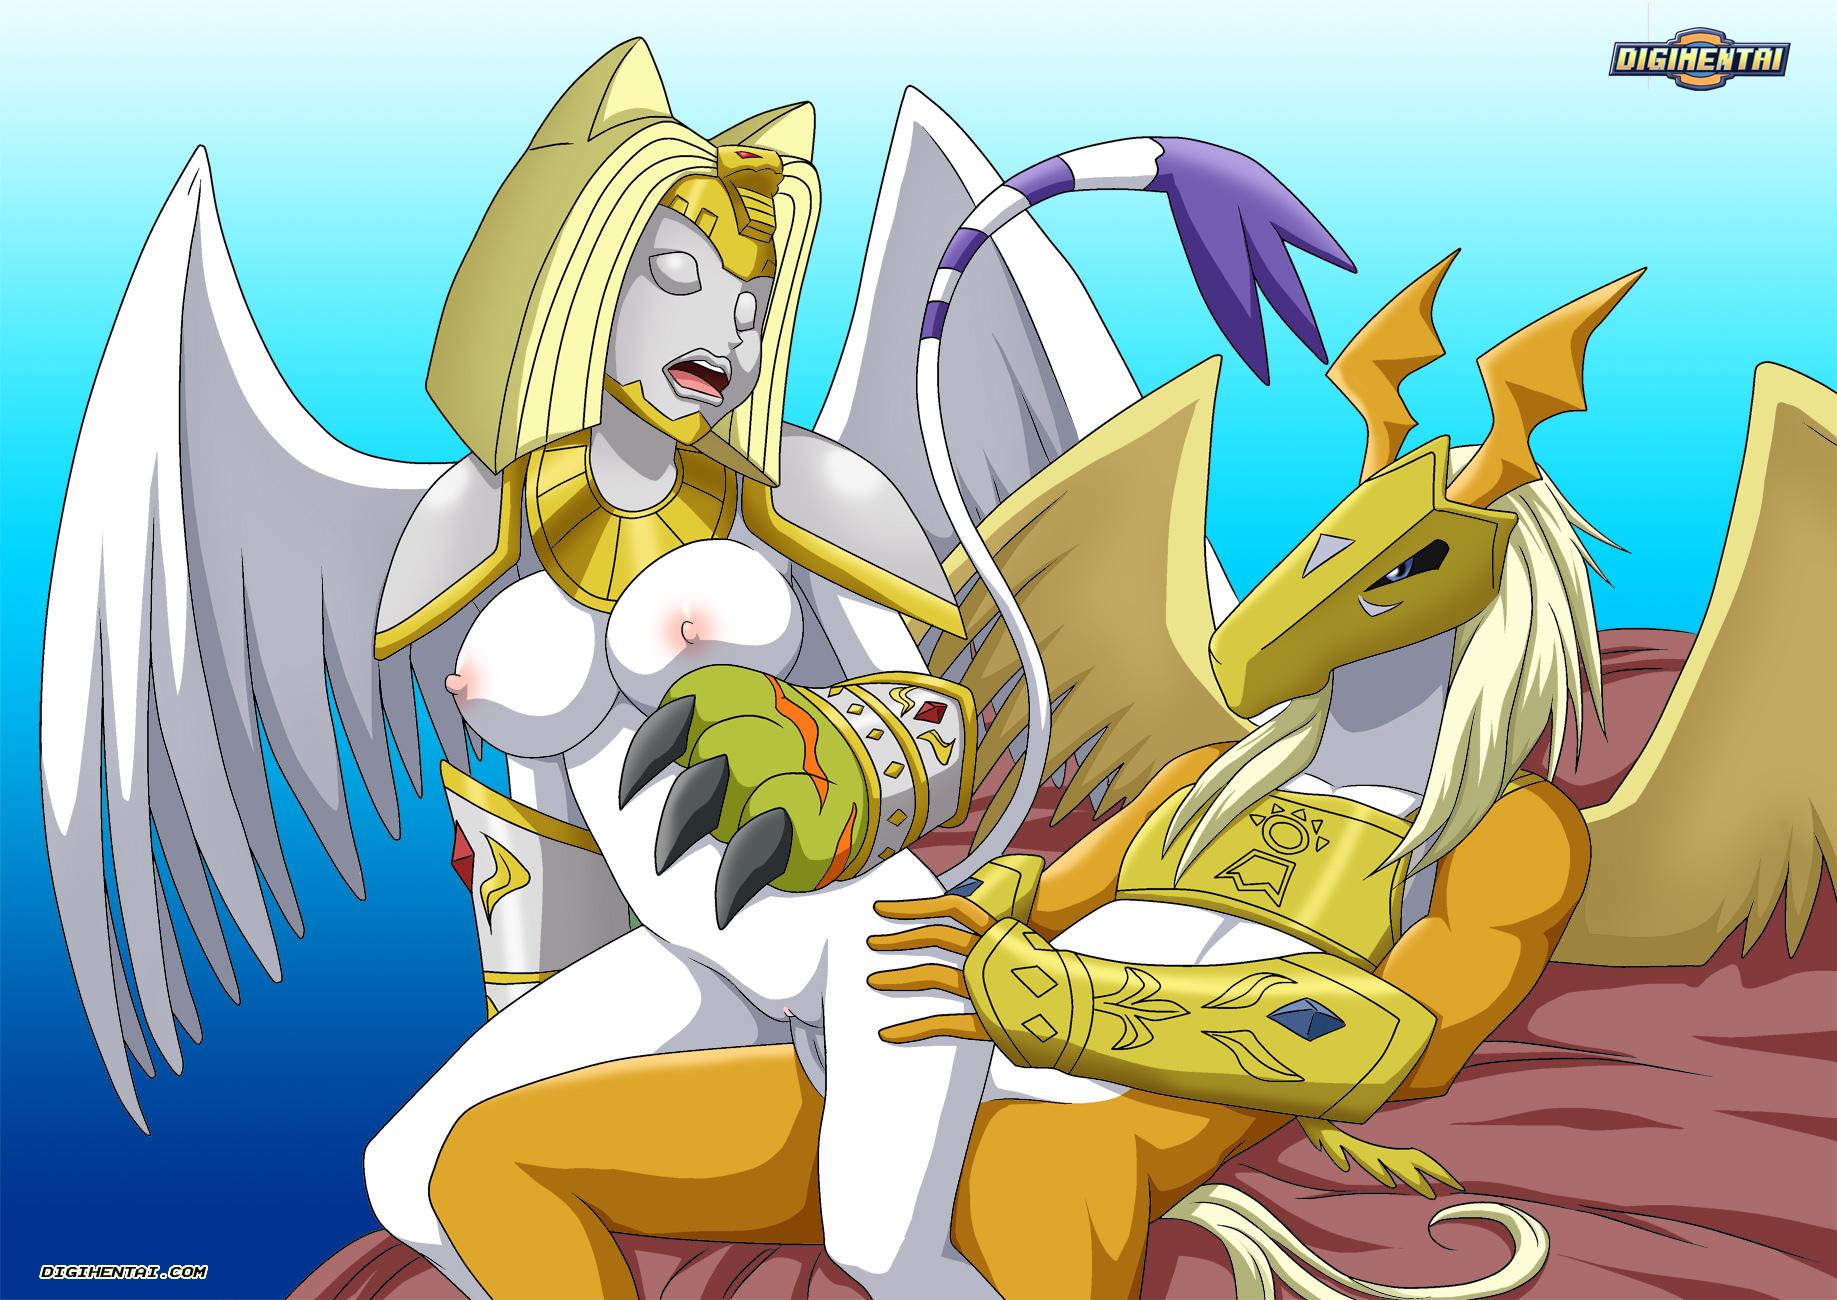 Doubtful. Digimon digital monsters hentai porn can